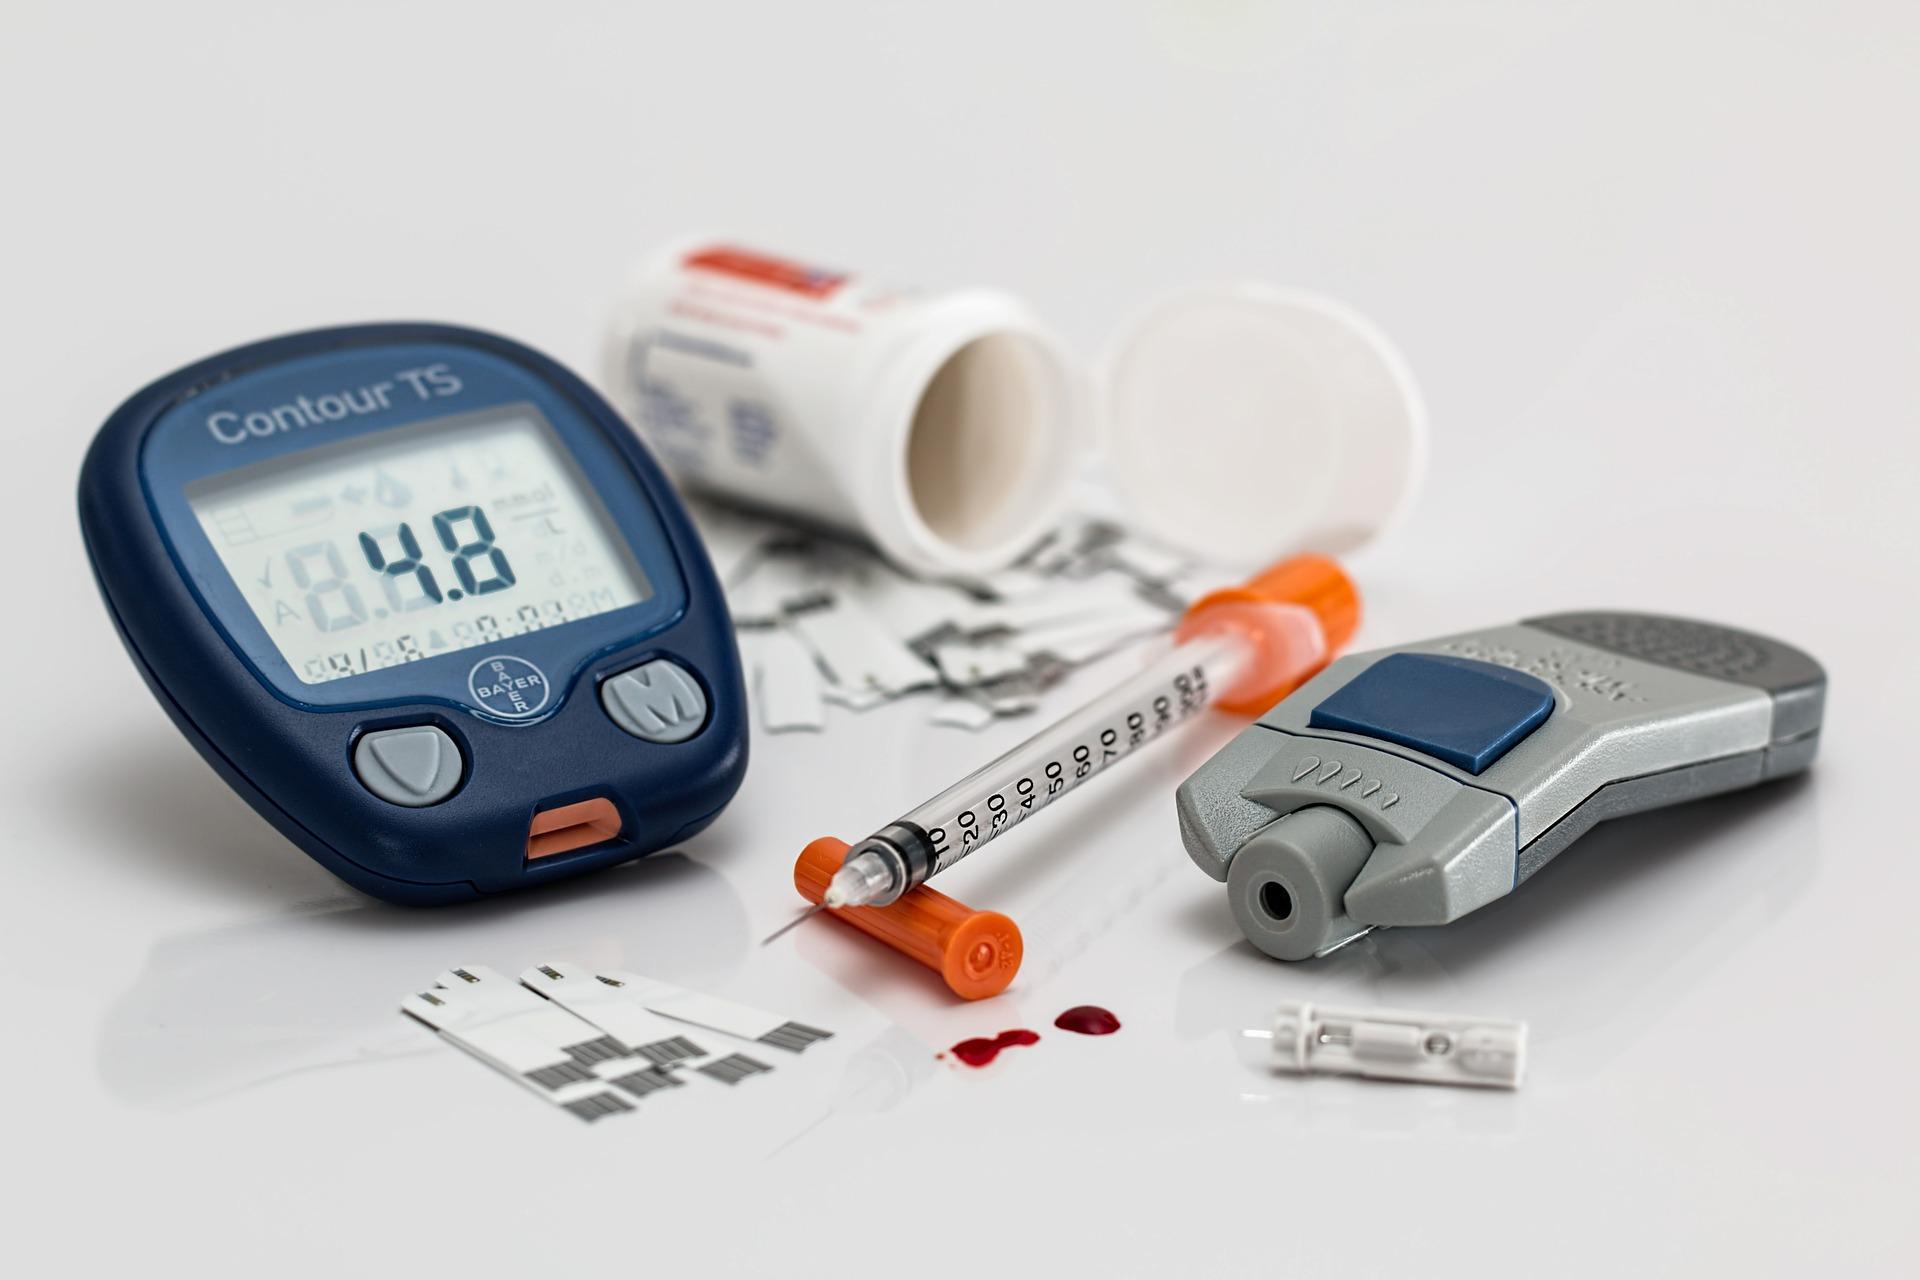 Diabetes e colesterol? Consulte um endocrinologista